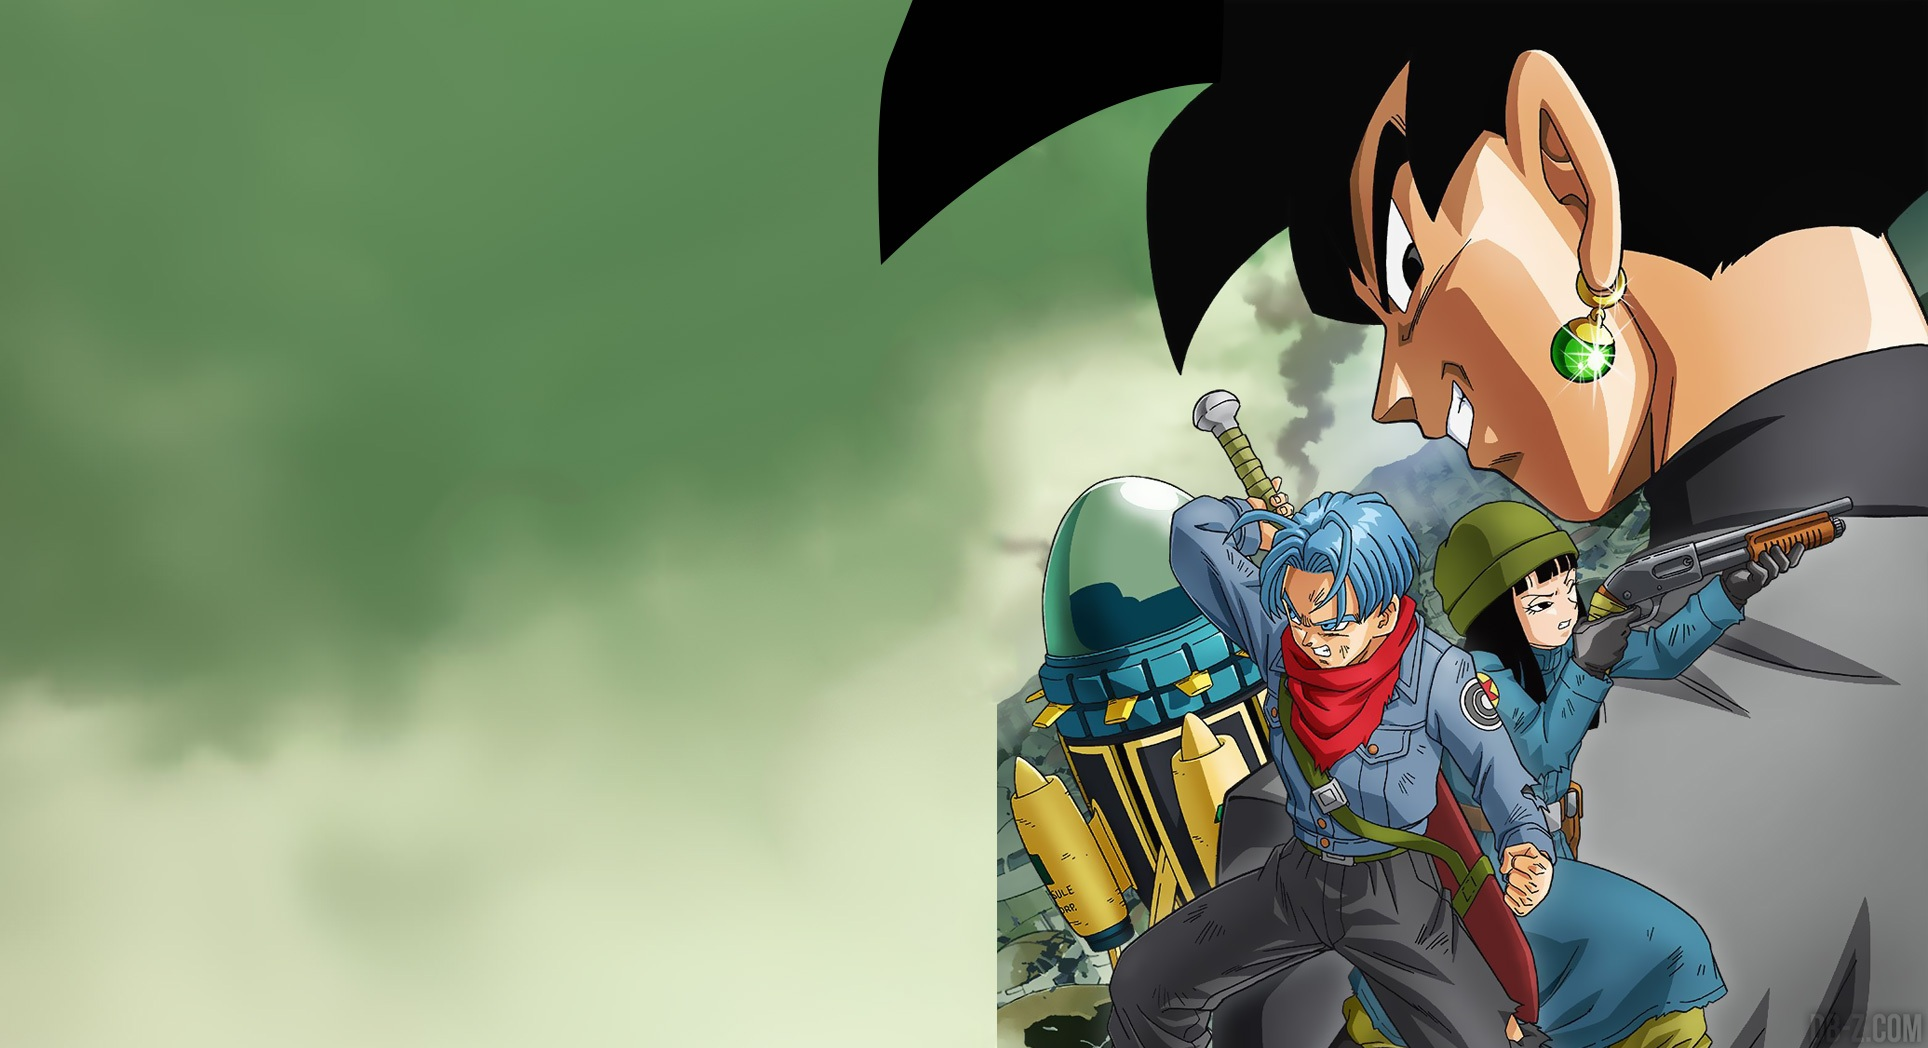 Visuel Hd Et Wallpaper De L Arc Trunks Black Goku Dans Dragon Ball Super